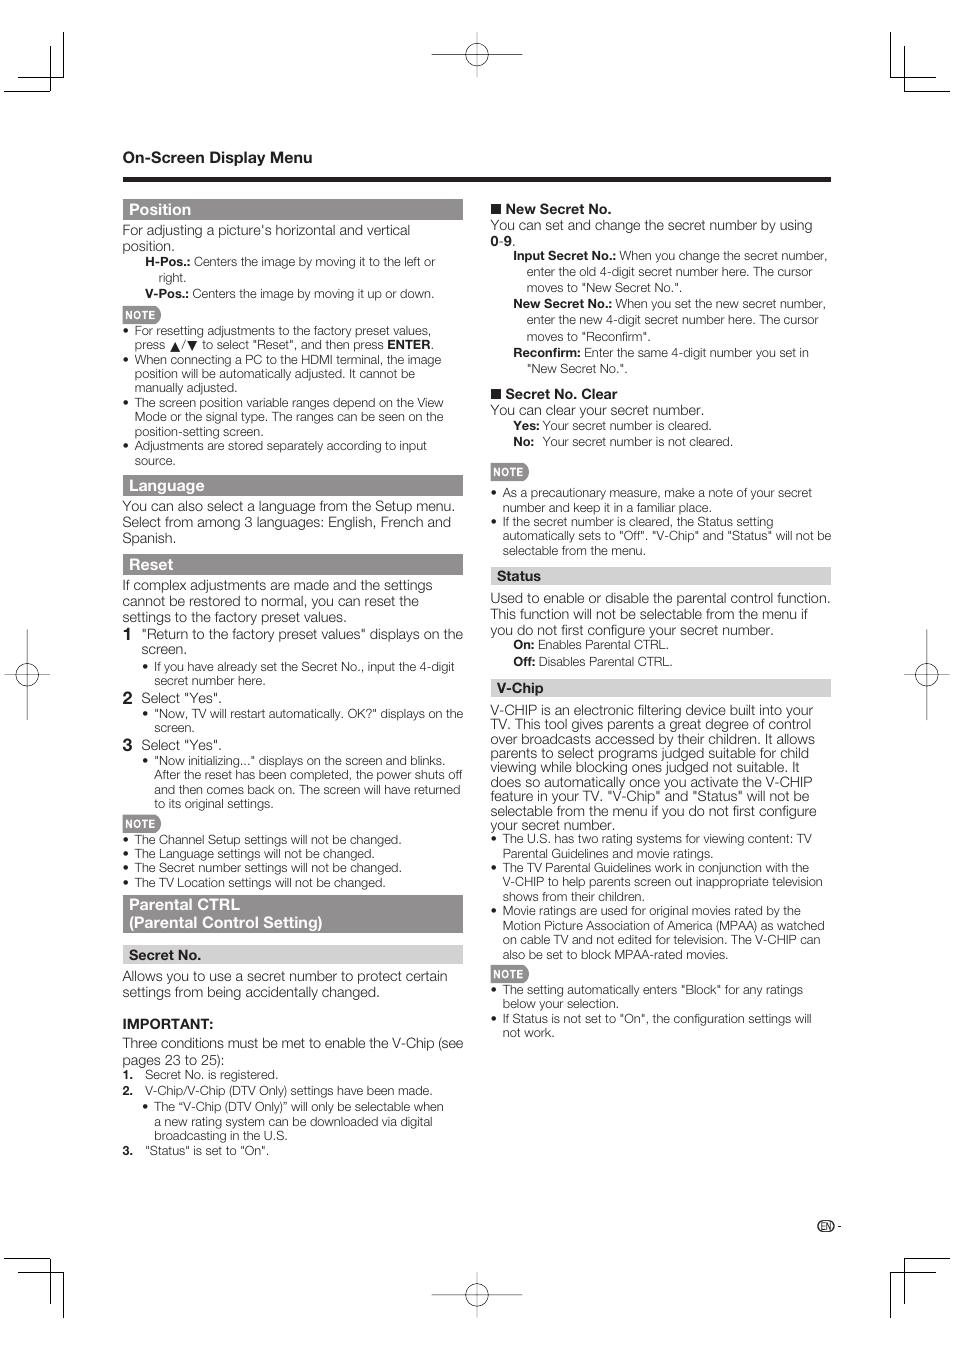 position language reset sharp aquos lc 37d64u user manual page rh manualsdir com sharp aquos lc37d64u manual Sharp Compet QS-2760H